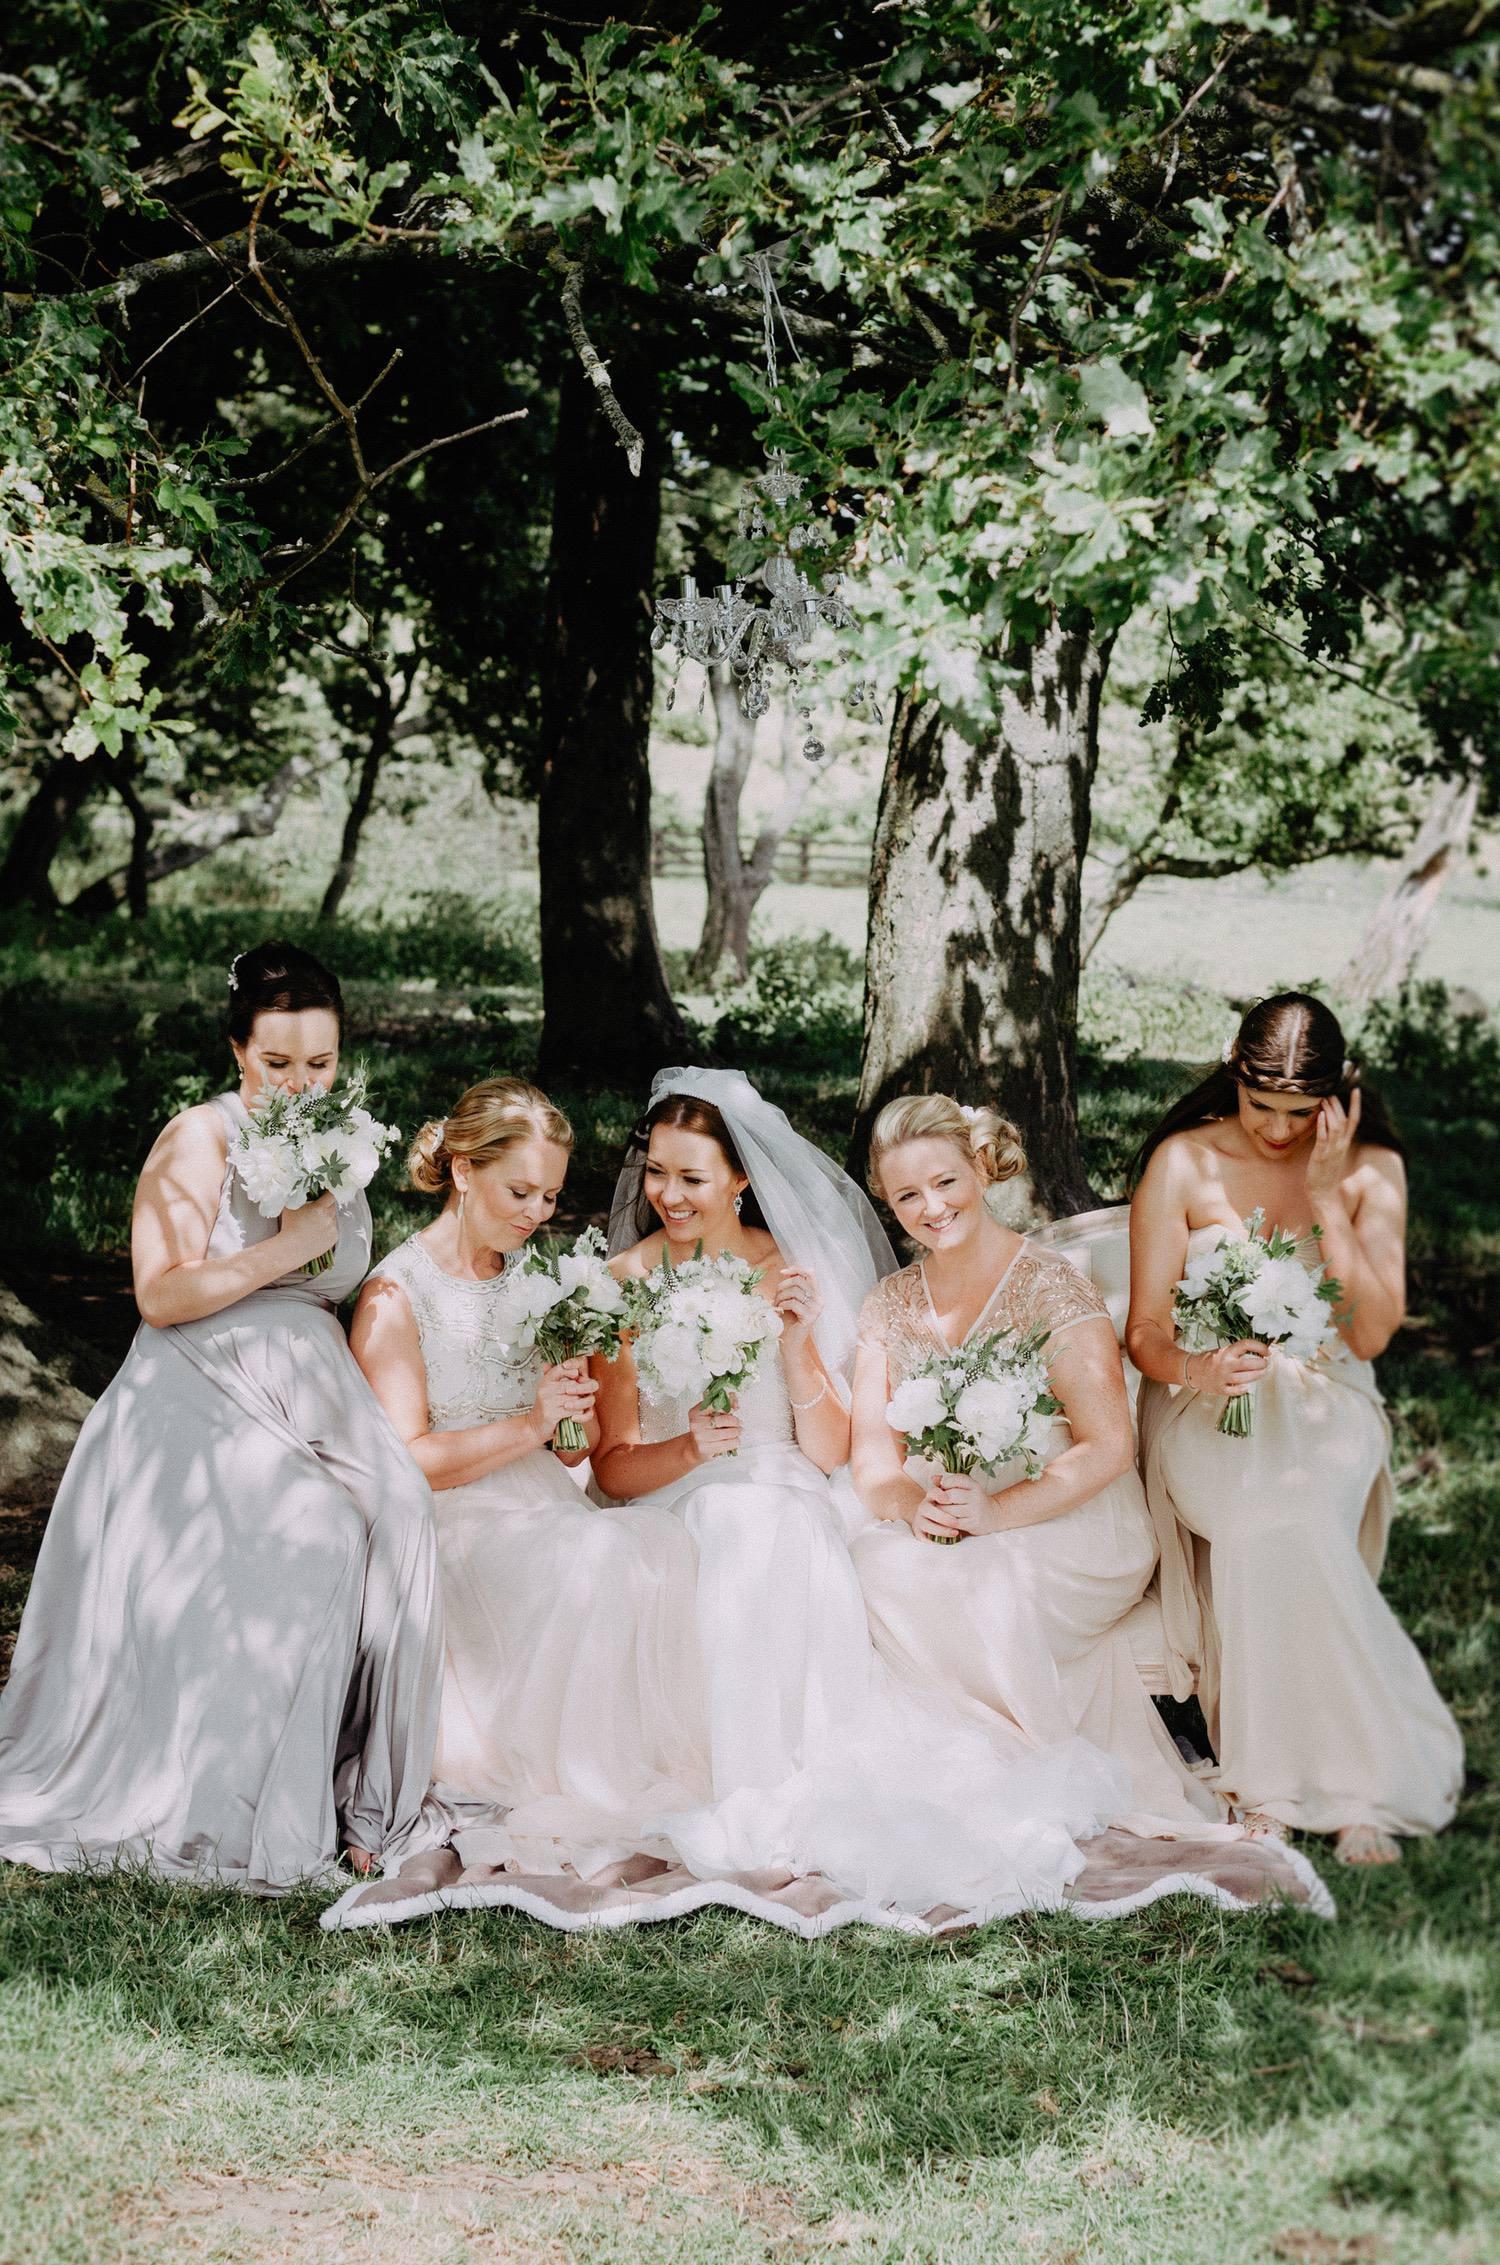 Natural-Retreats-Yorkshire-Wedding-Photographer-54.jpg